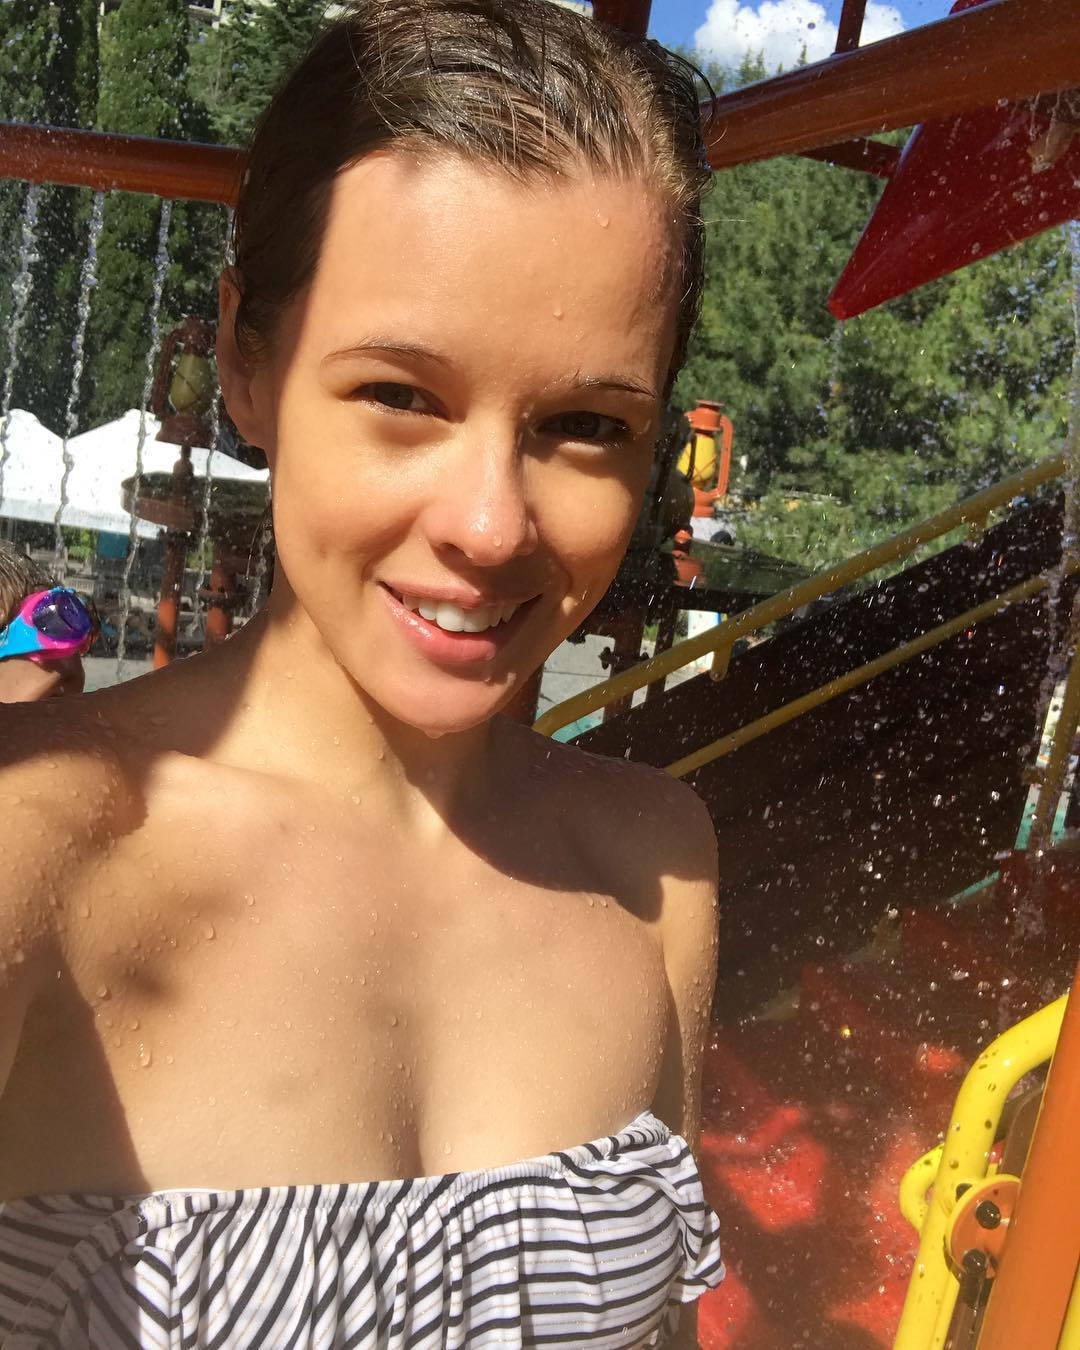 Екатерина Шпица: А потом был аквапааааааарк